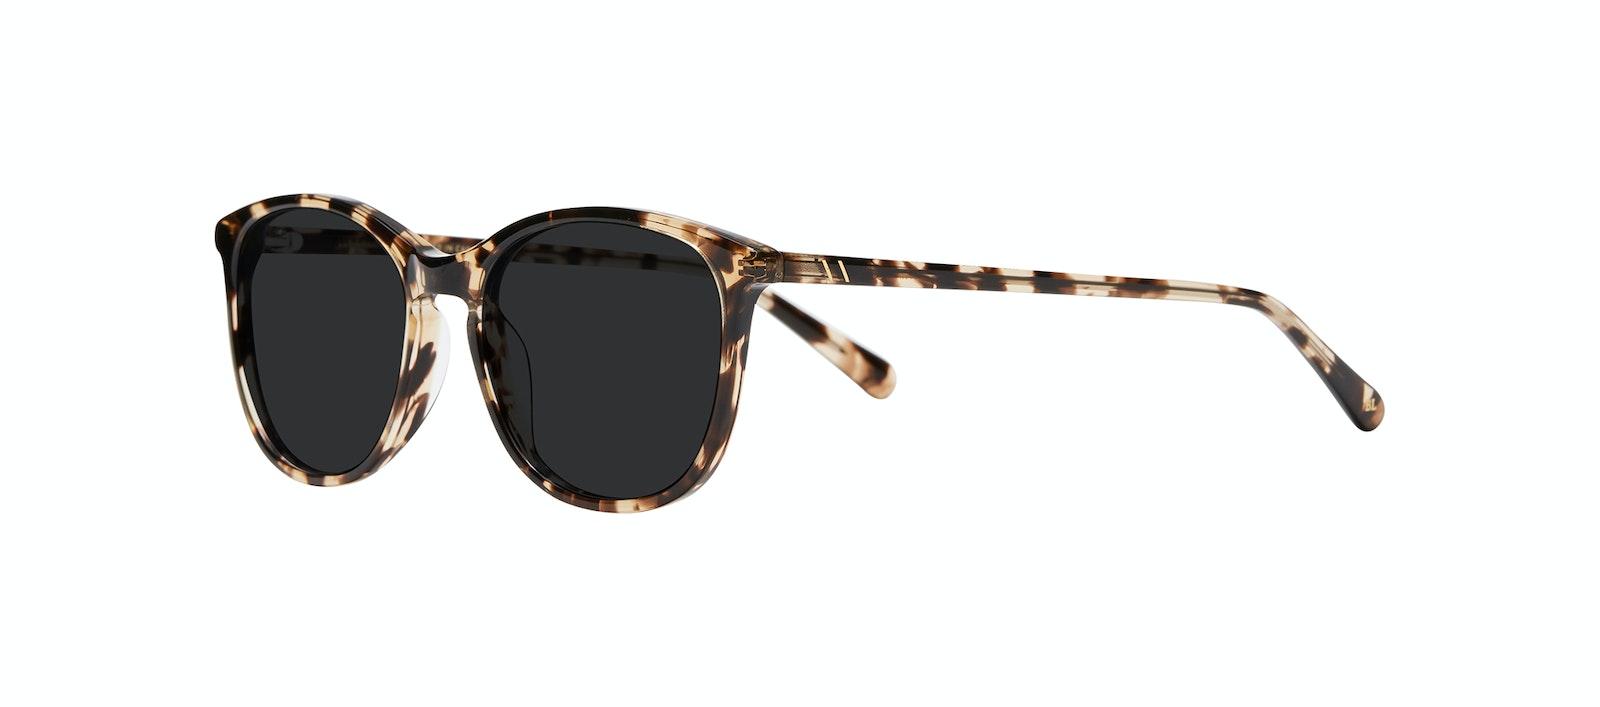 Affordable Fashion Glasses Rectangle Square Round Sunglasses Women Nadine S Snake Skin Tilt